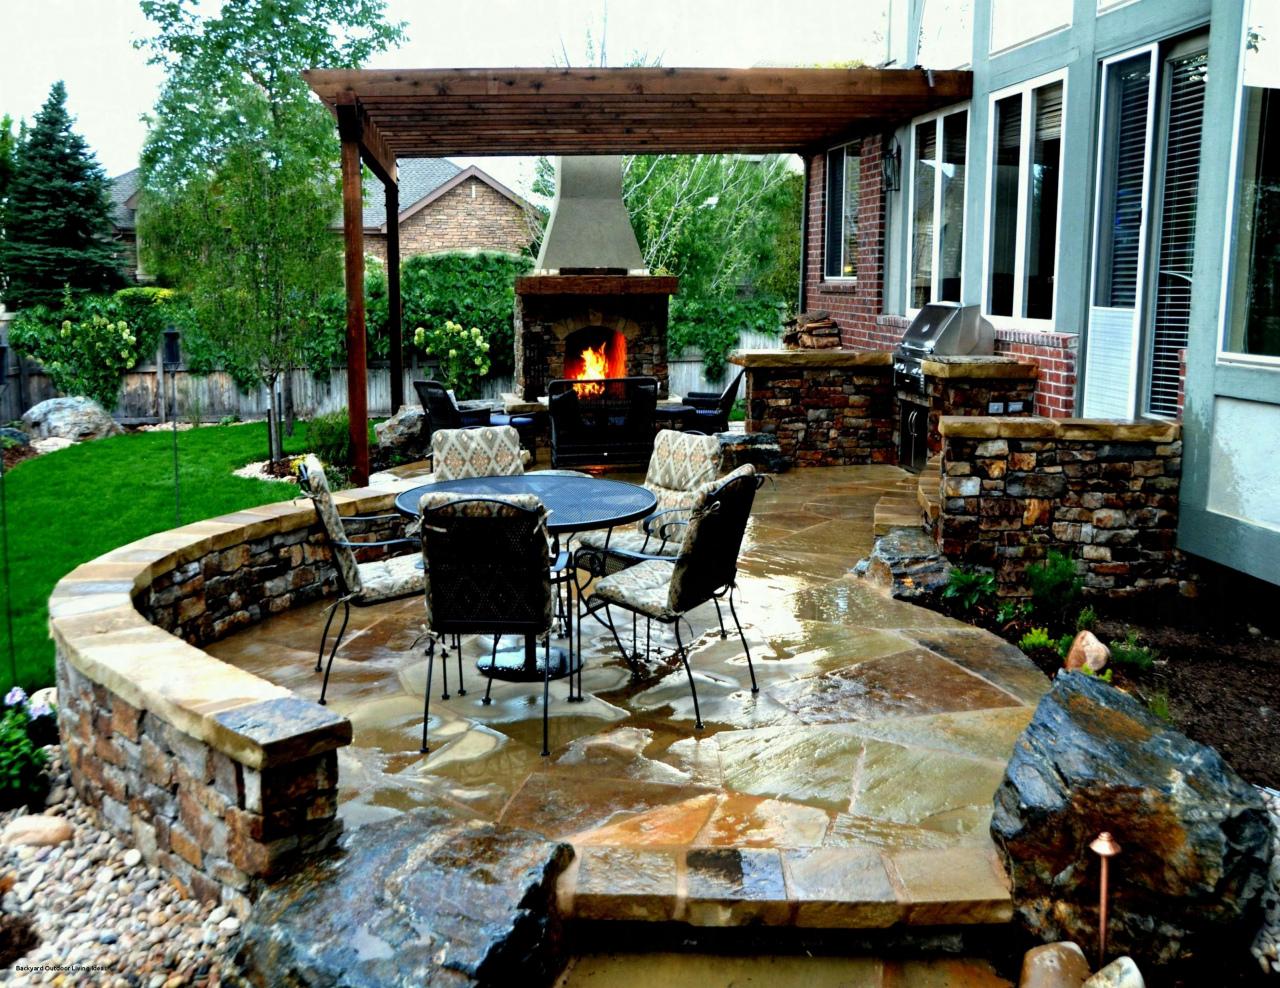 backyard patio ideas rattan garten inspirierend outdoor furniture sale near me awesome durch backyard patio ideas